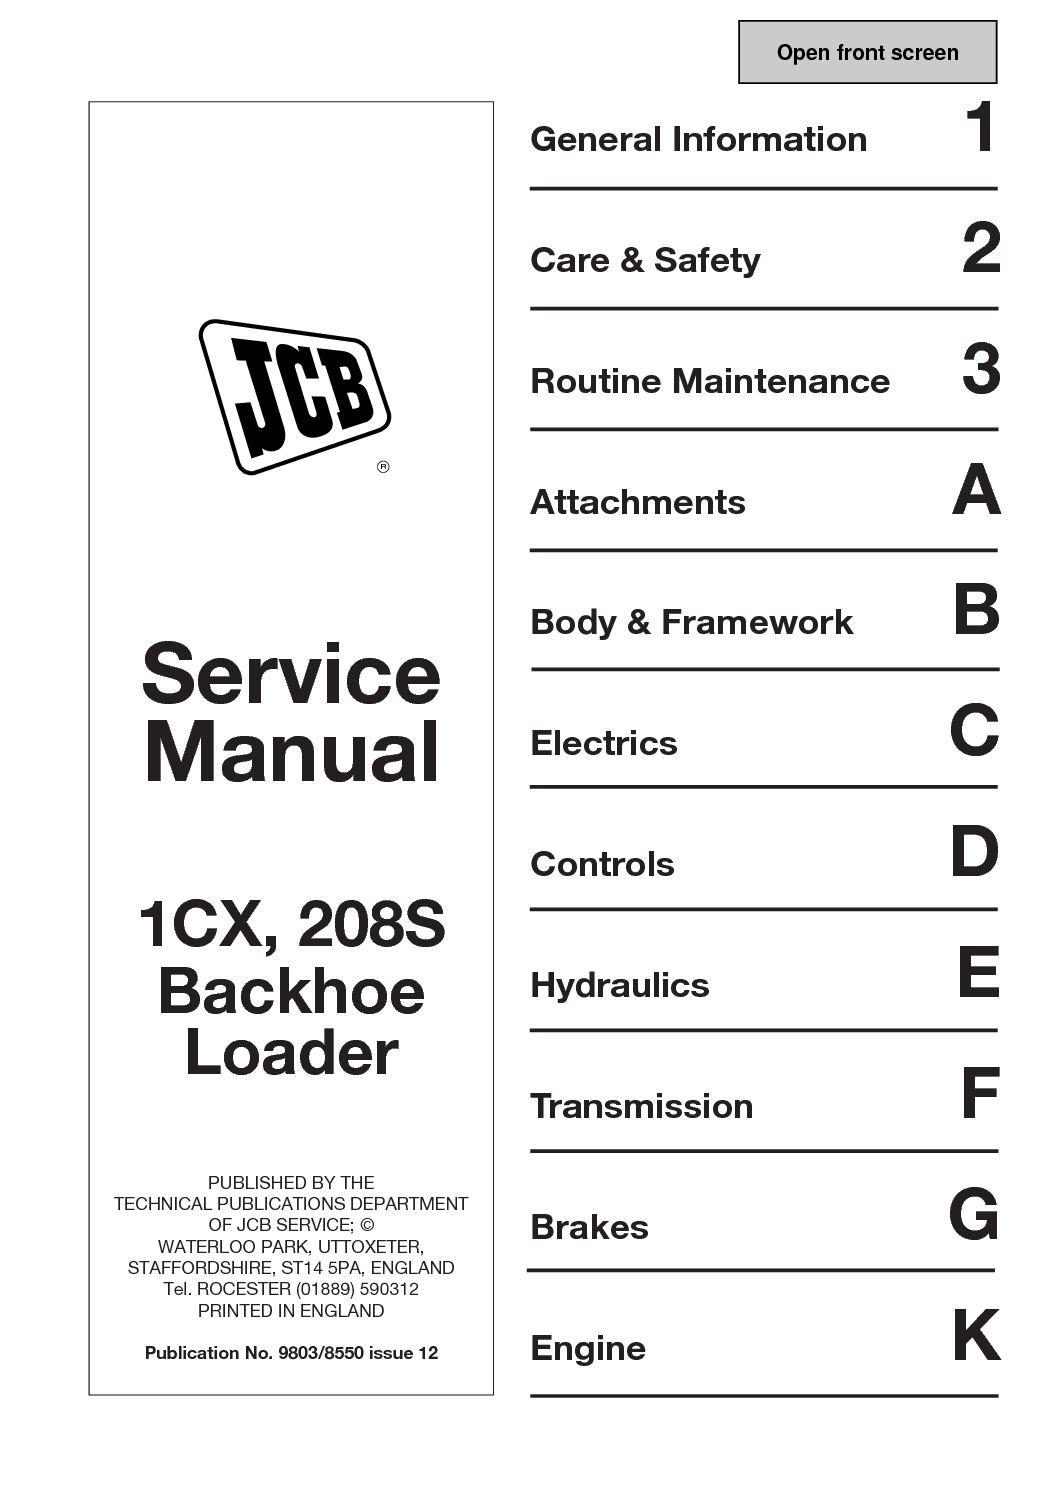 Calaméo - JCB 1CX BACKHOE LOADER Service Repair Manual SN(751600 To